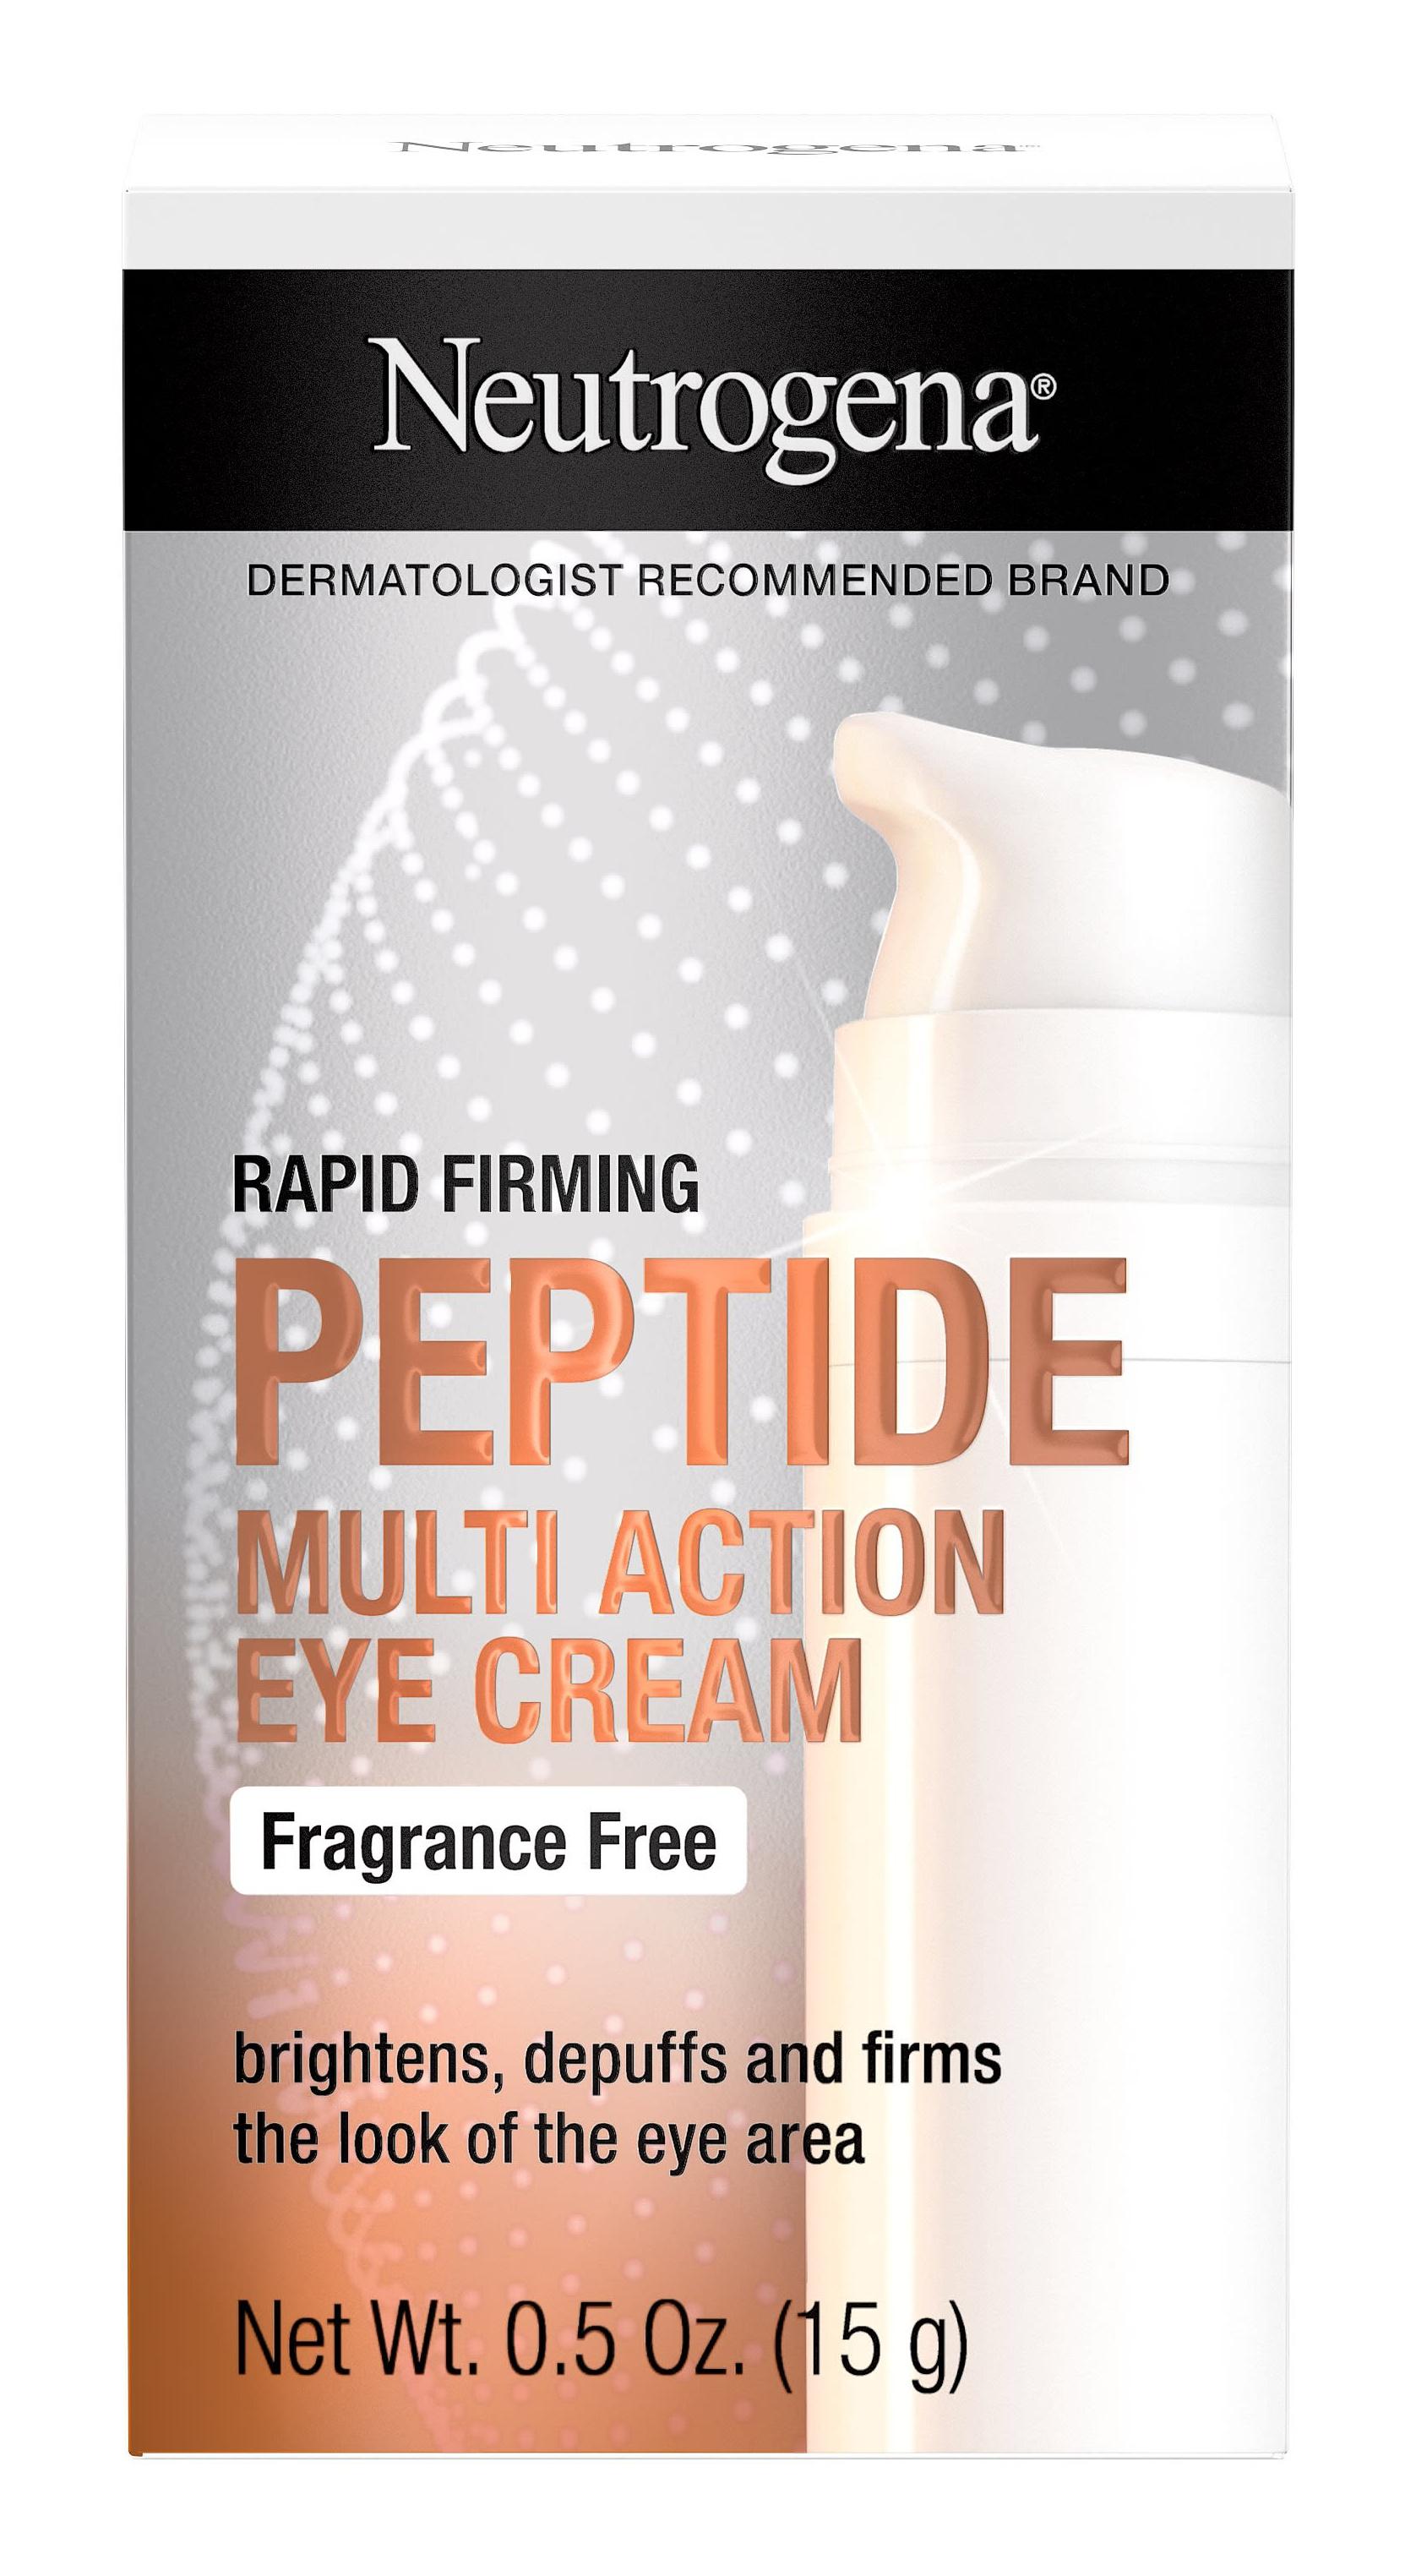 Neutrogena Rapid Firming Peptide Multi Action Eye Cream